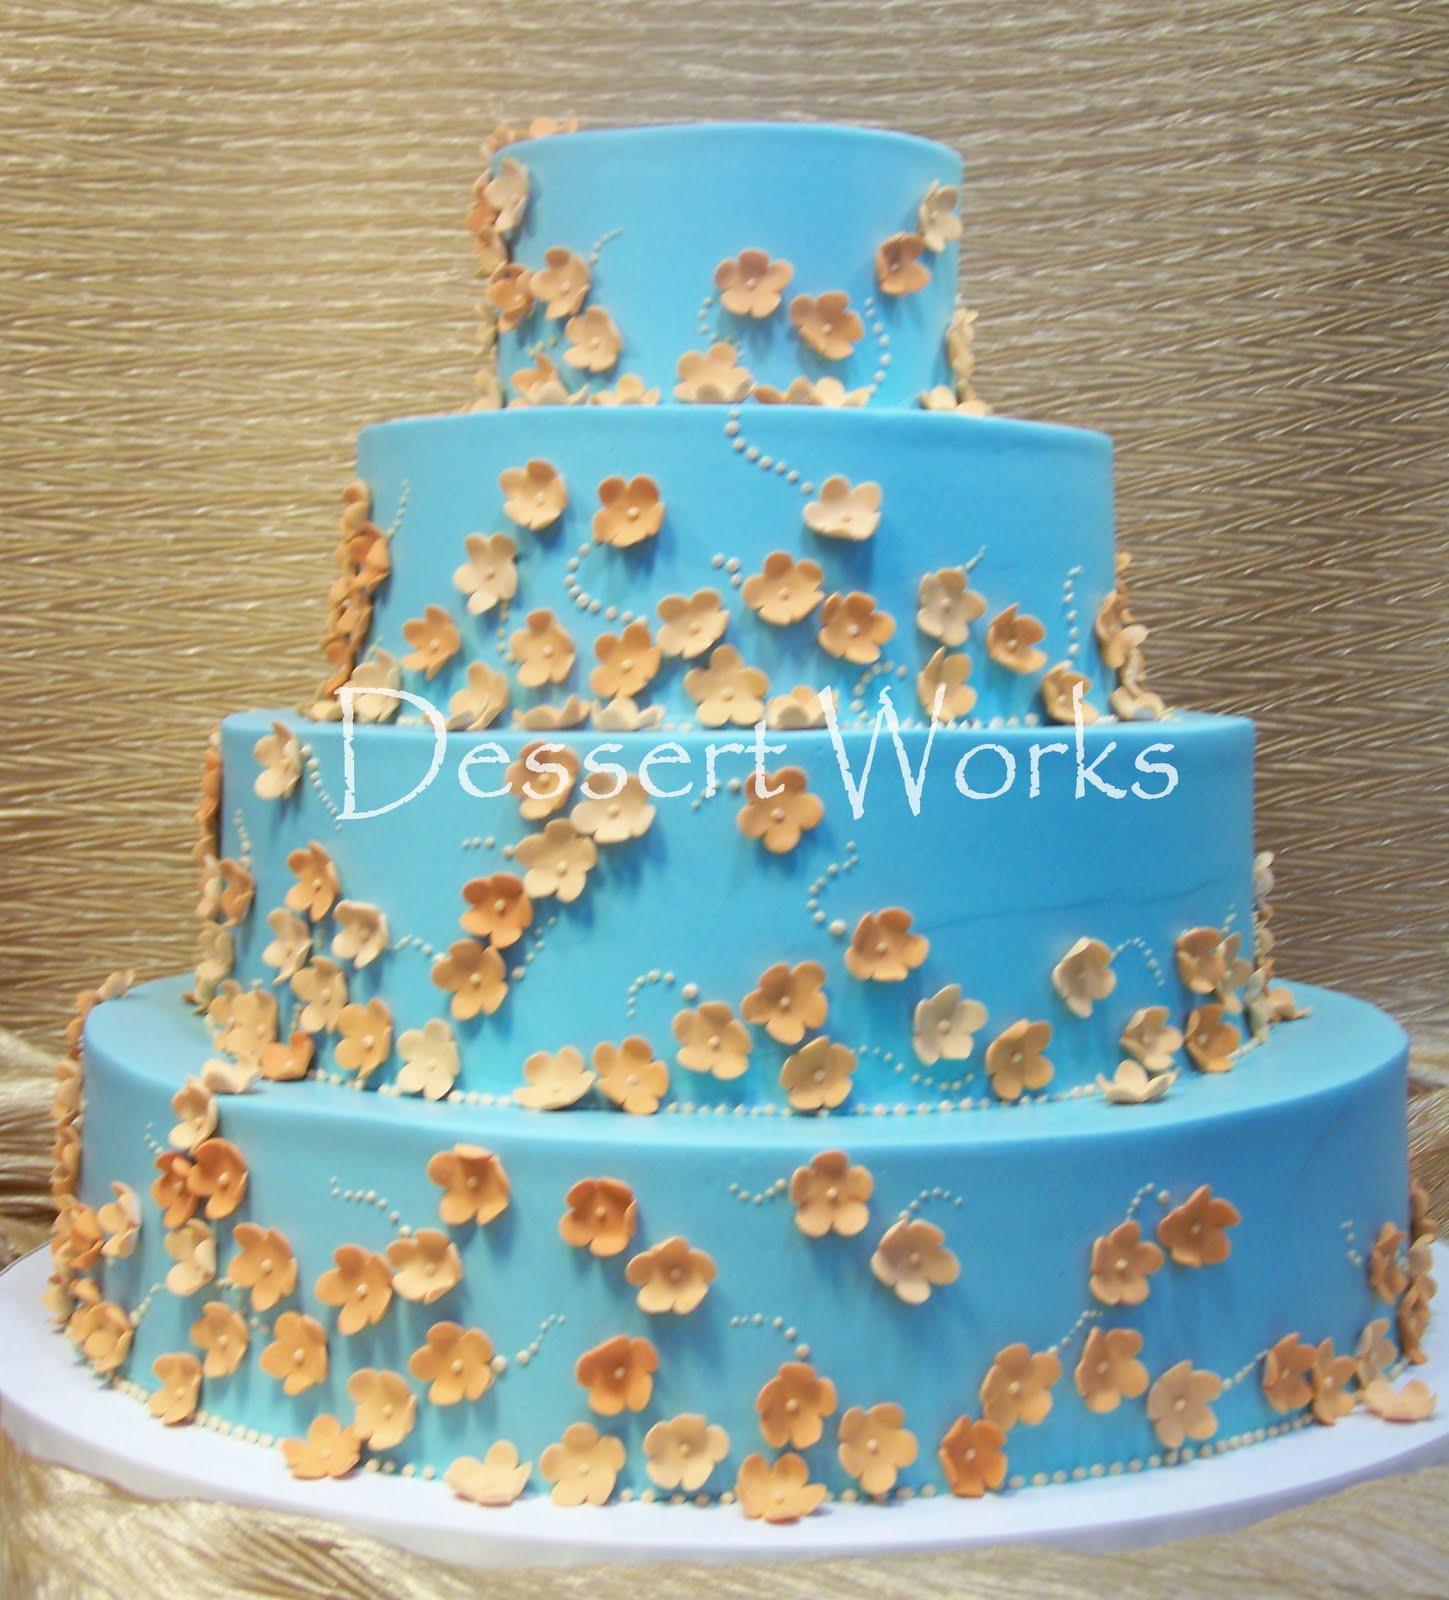 Dessert Works Bakery: Blue & Orange